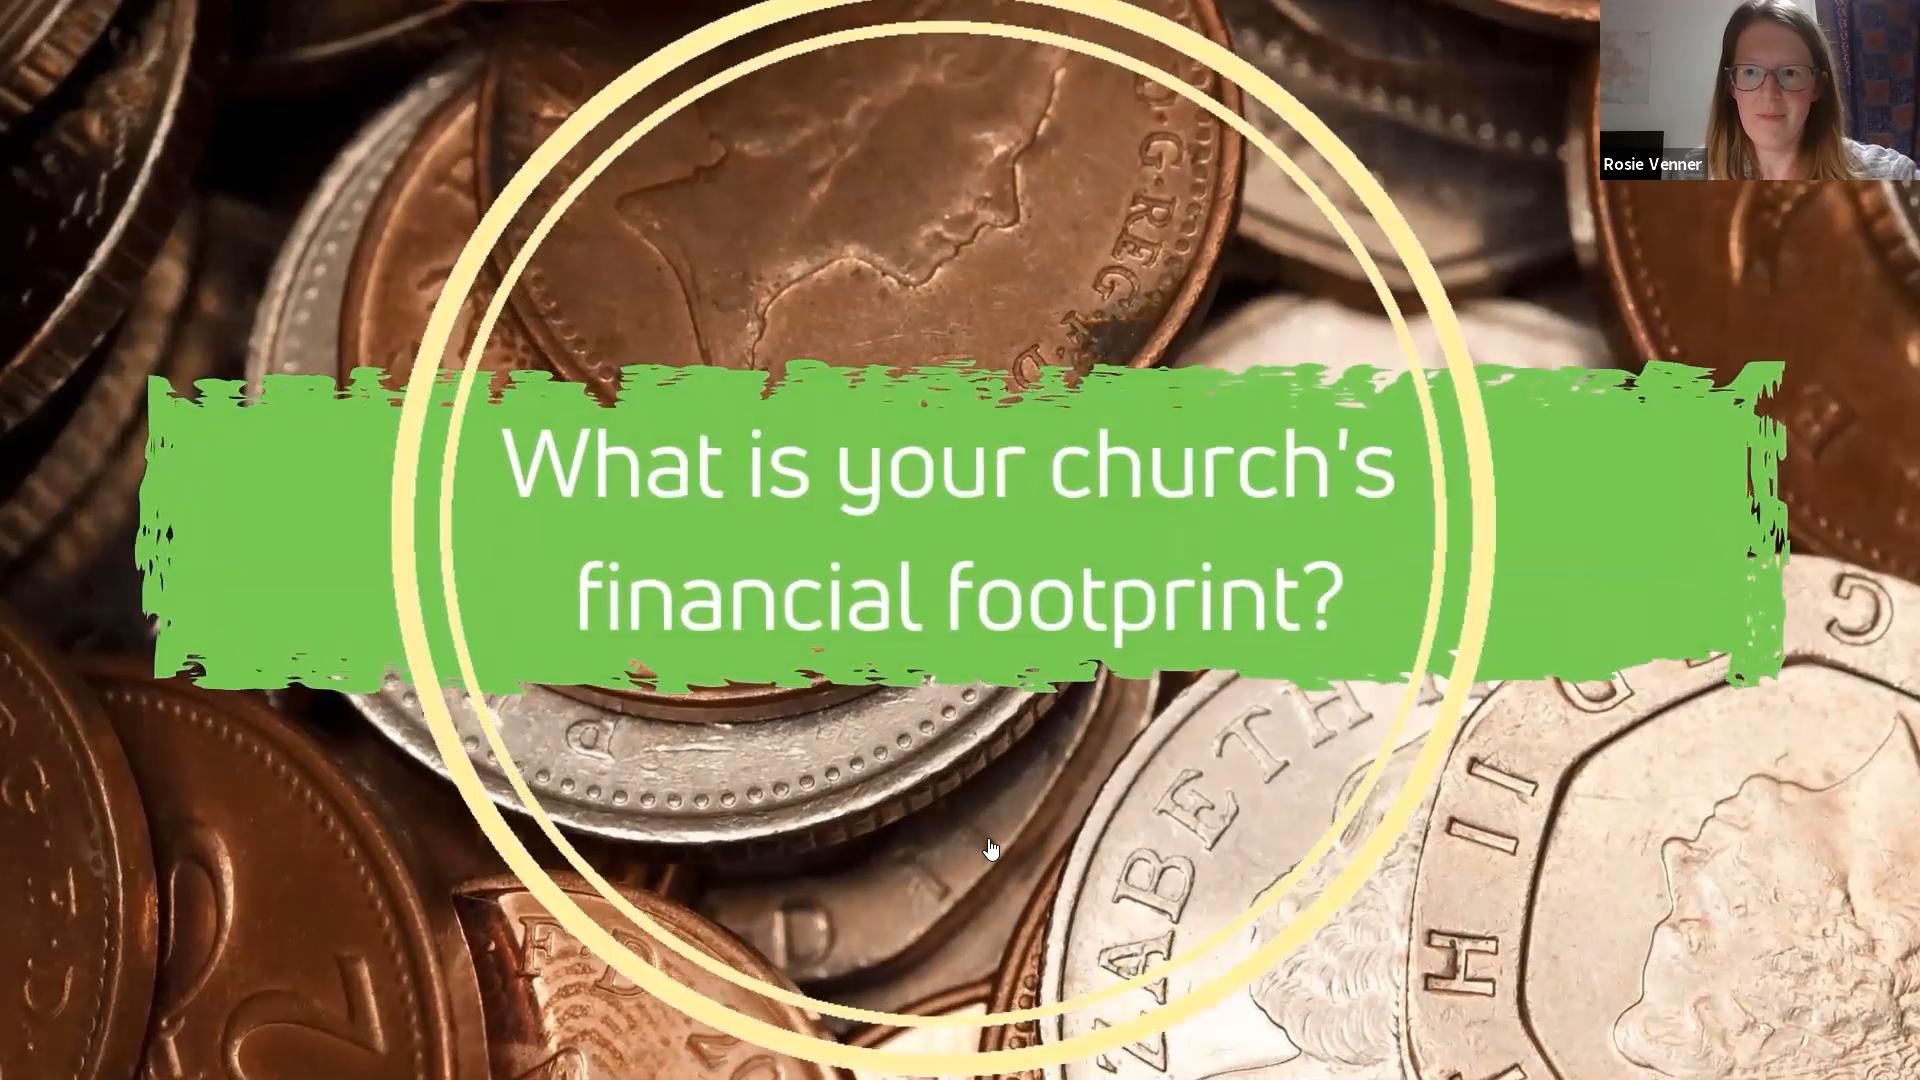 Restoring Hope | Your church's financial footprint (29 October 2020)